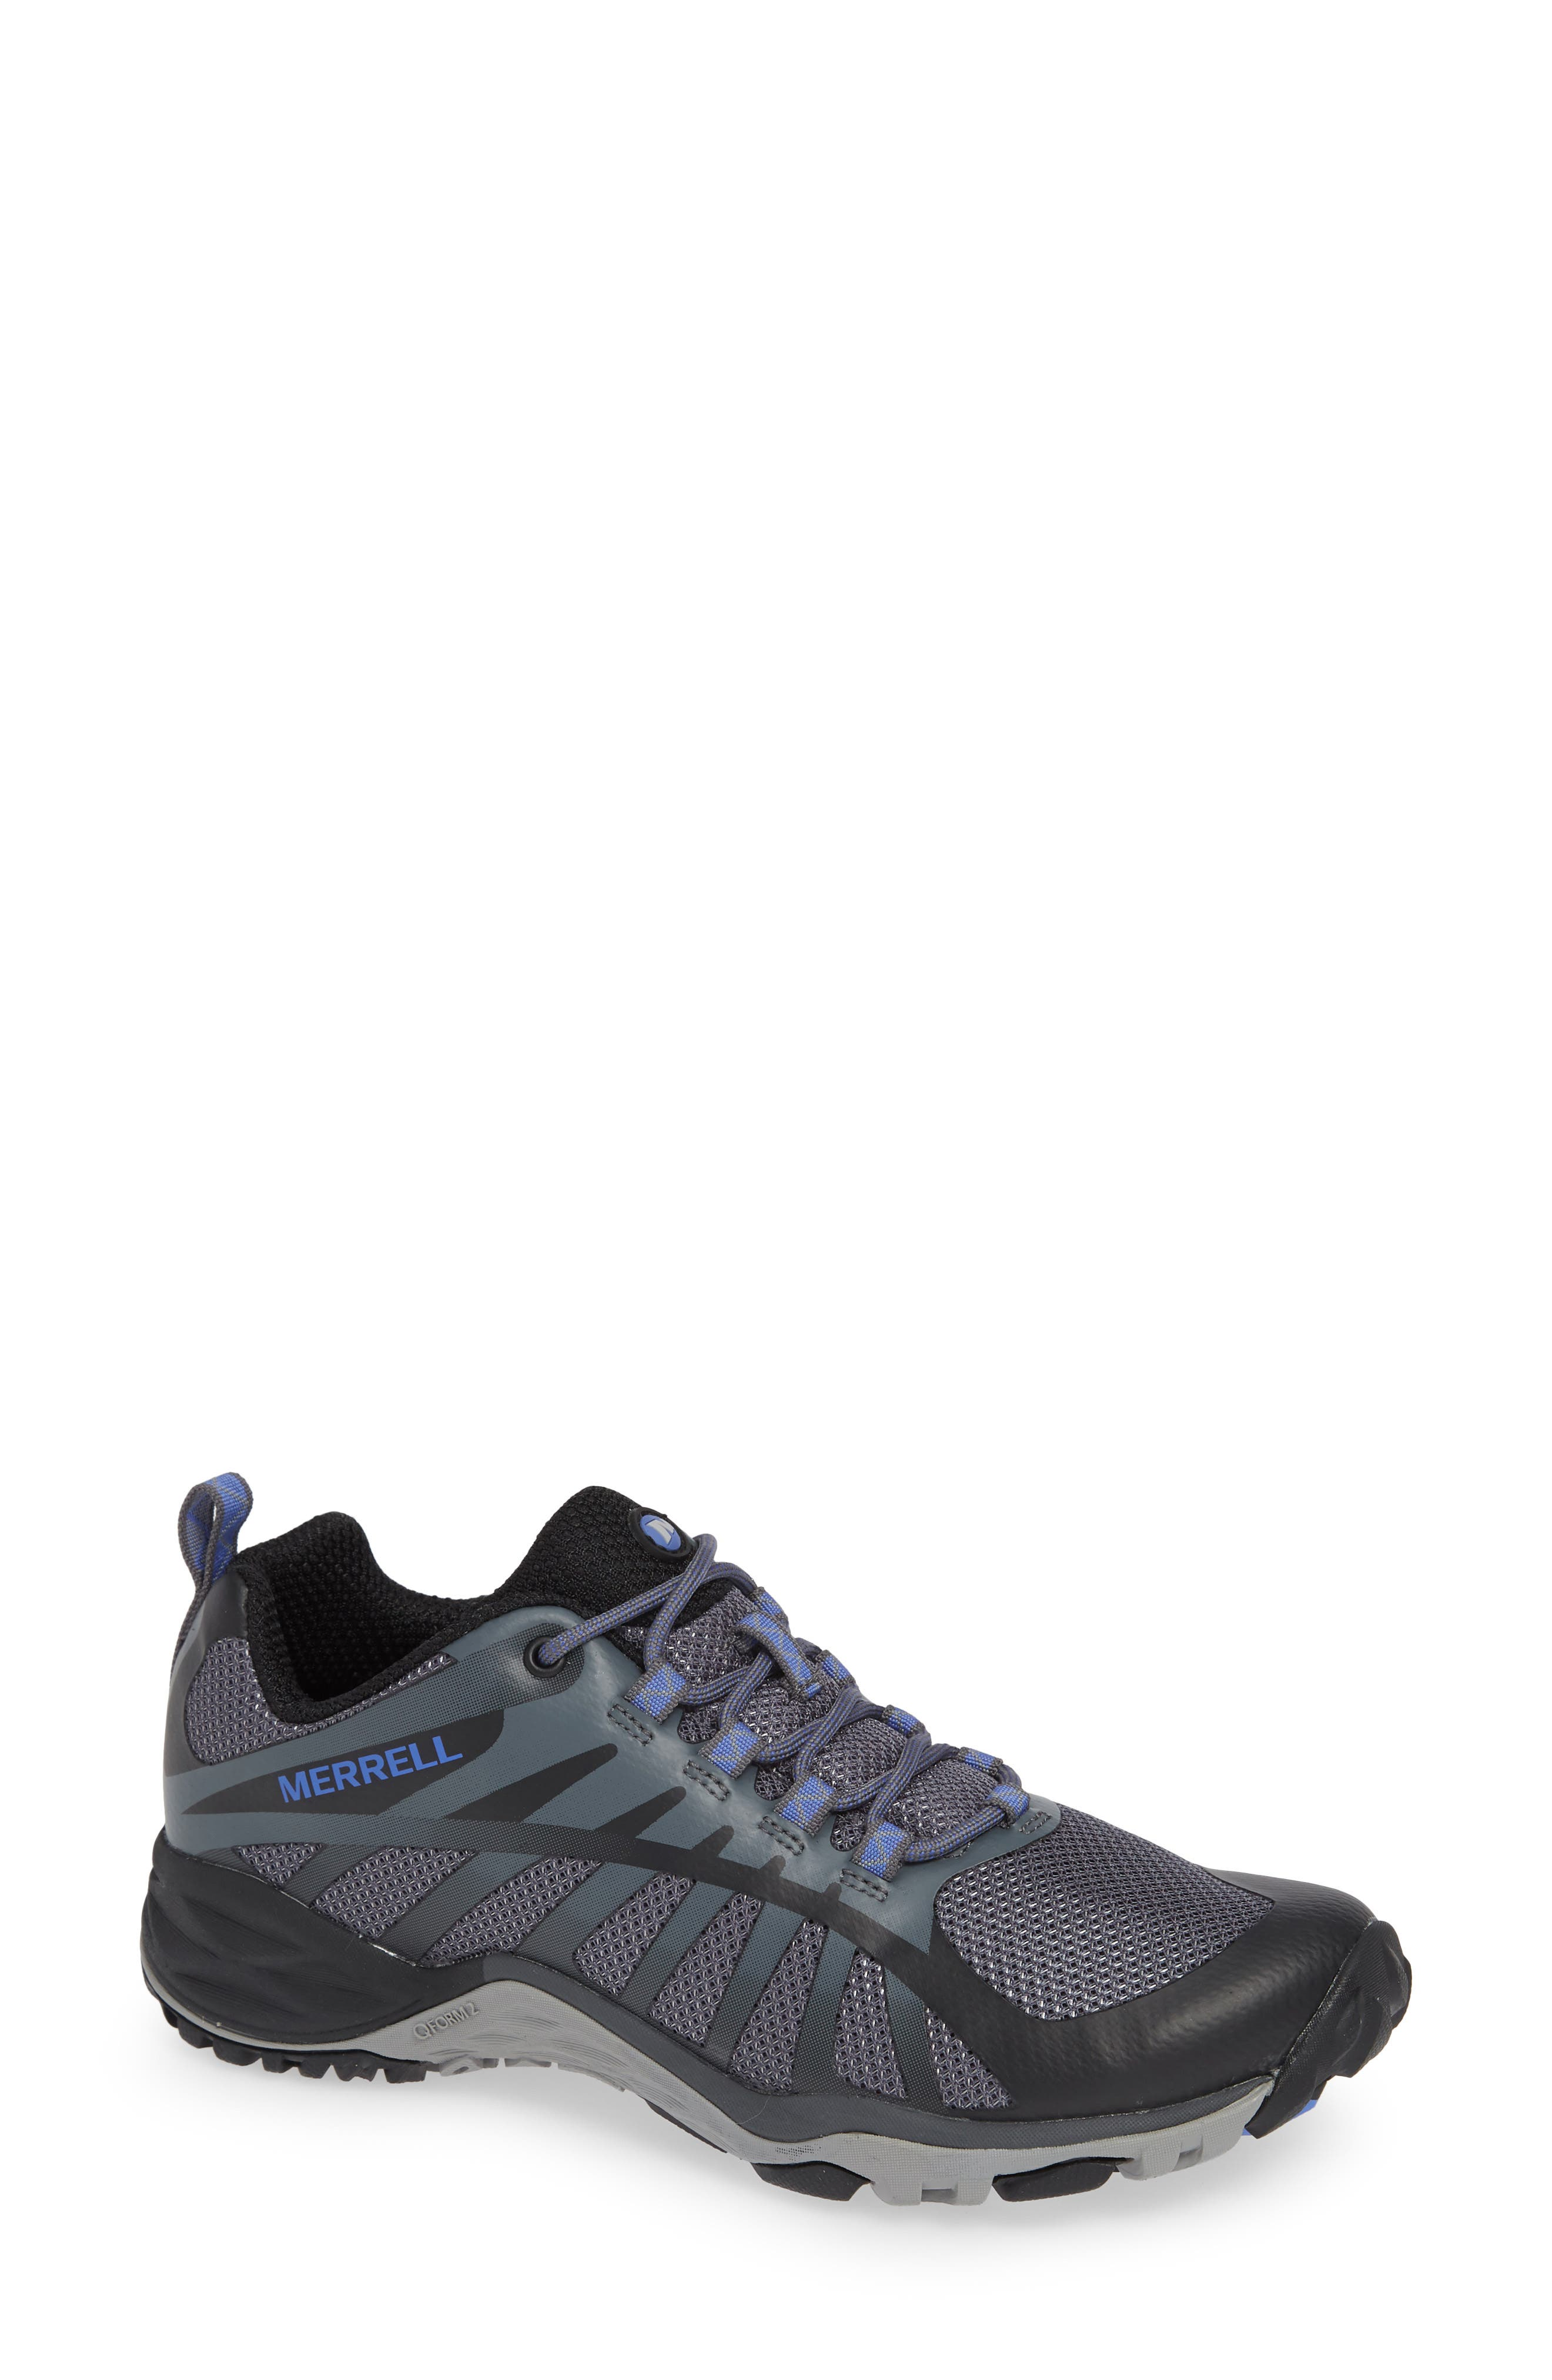 MERRELL Siren Edge Q2 Hiking Shoe, Main, color, BLACK FABRIC